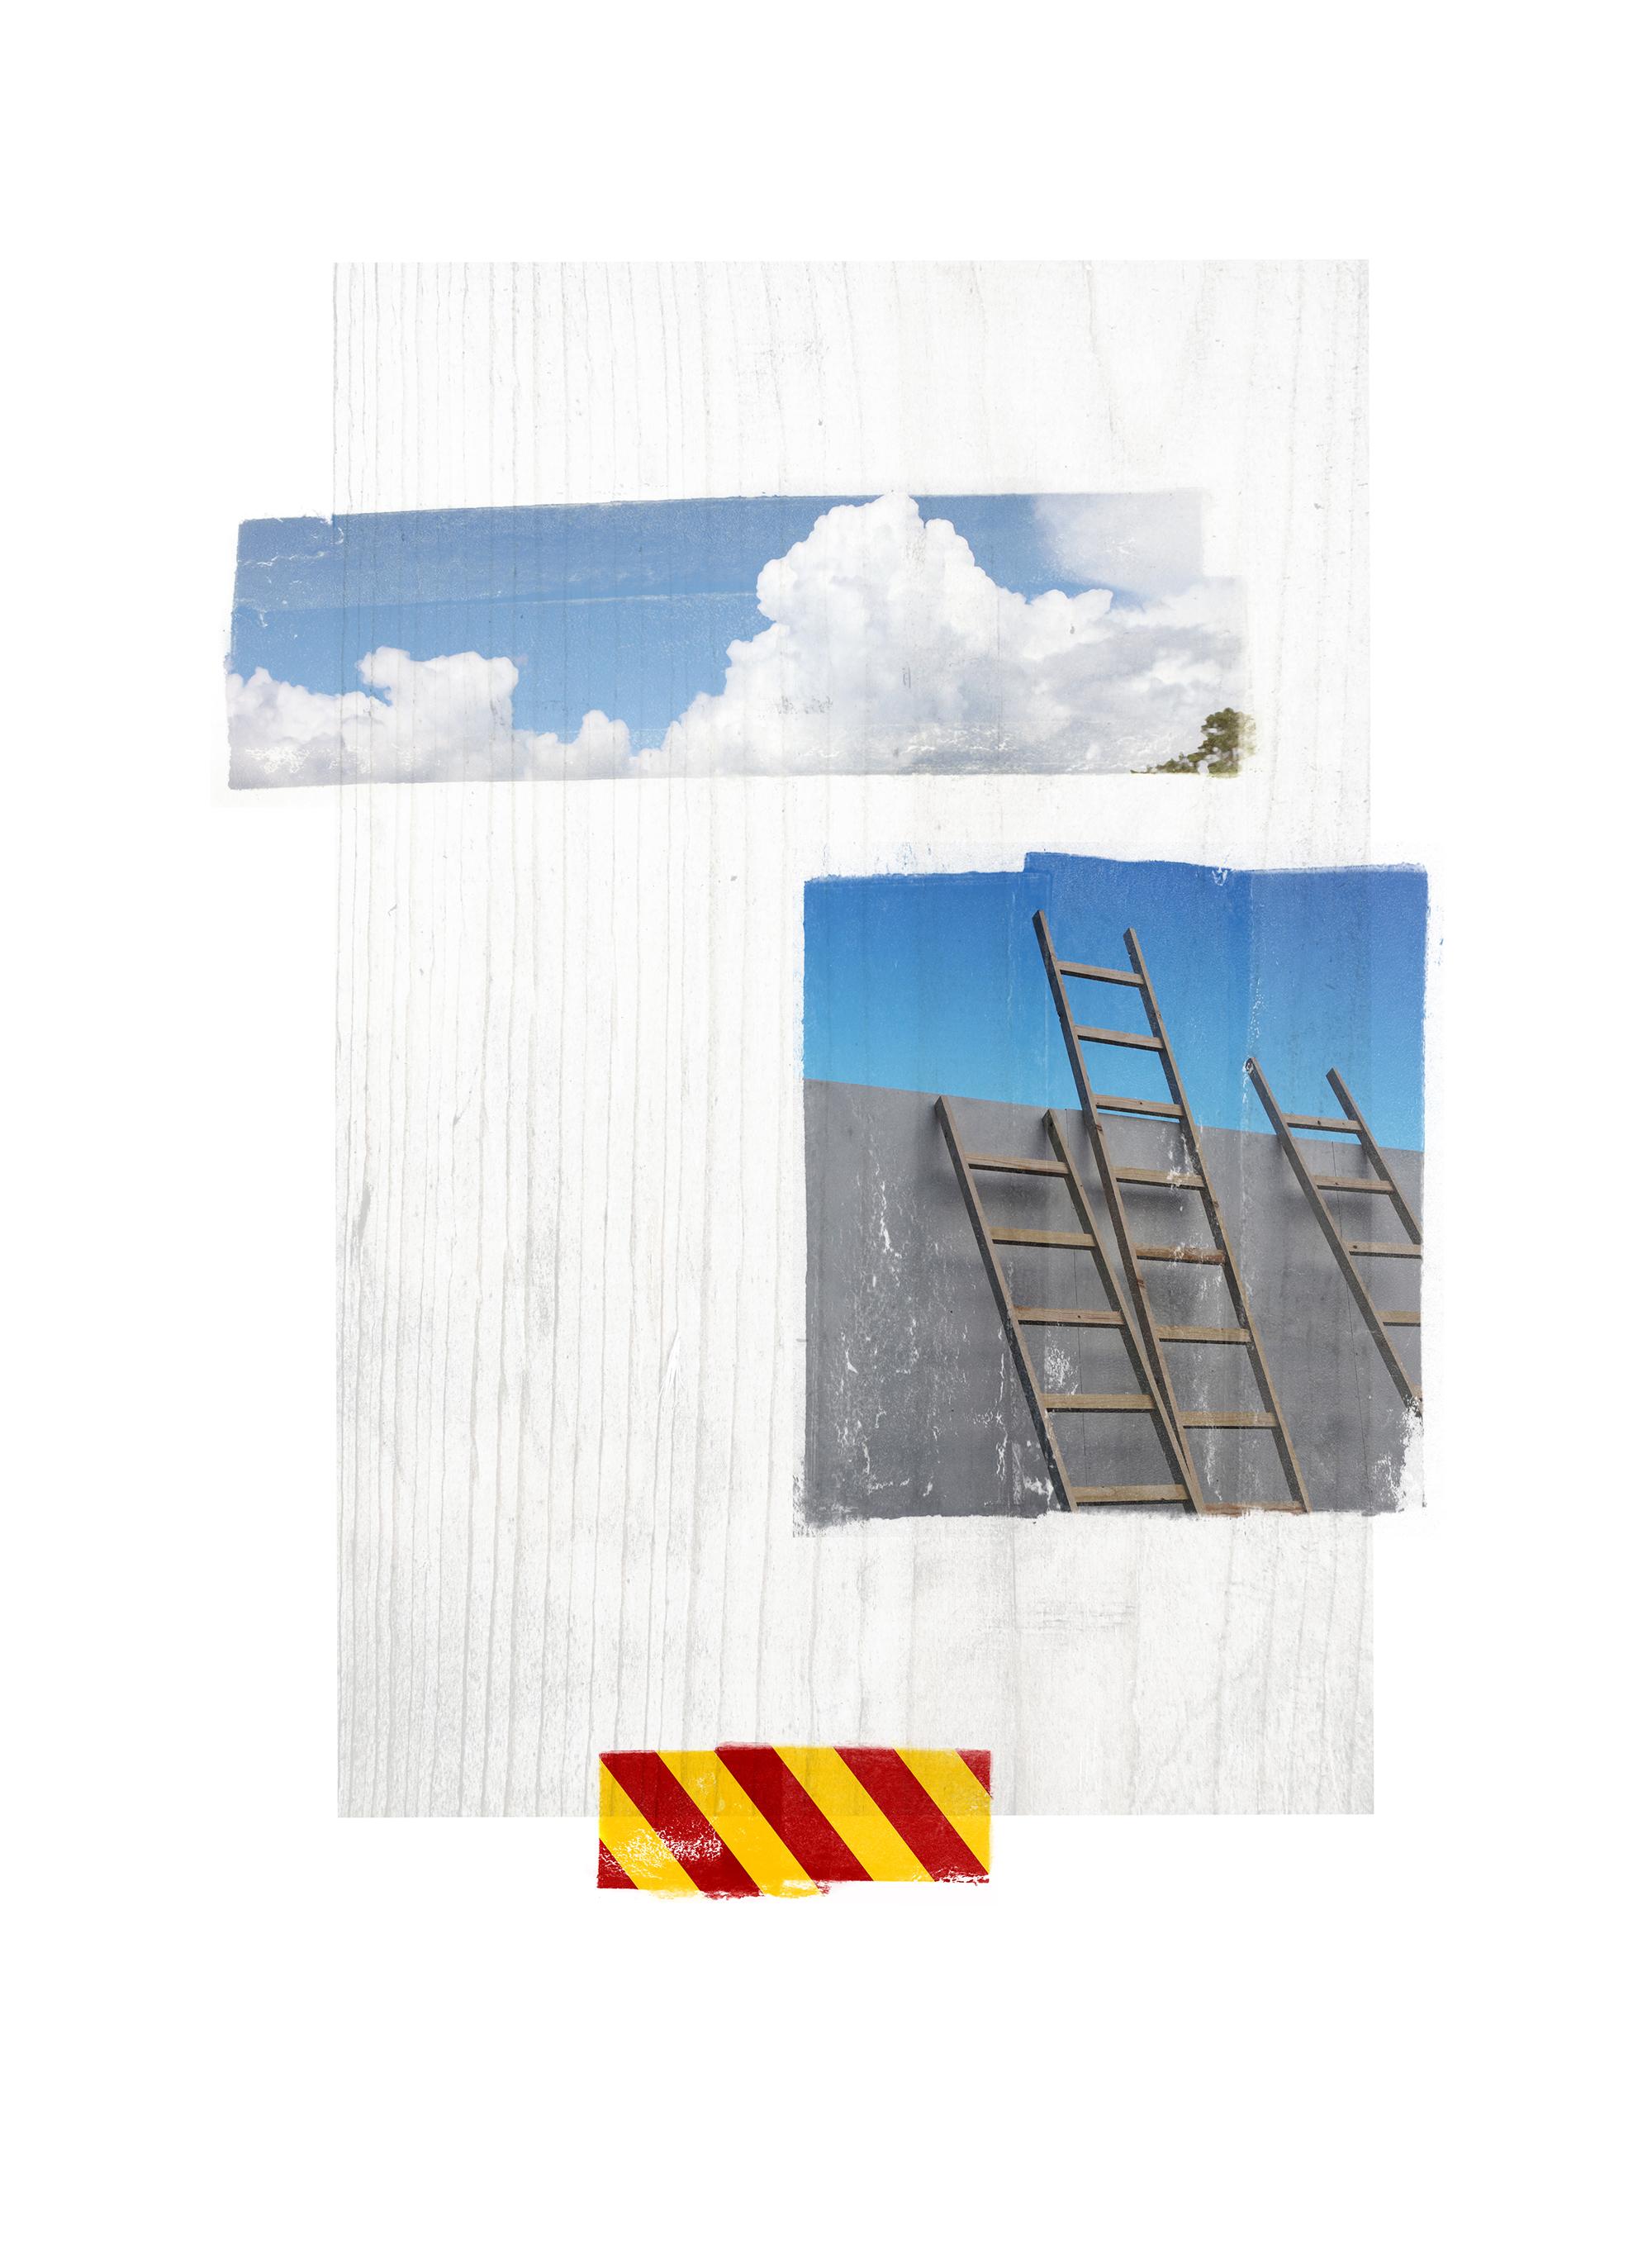 Venia / Cumulus  Original pigment print / BFK rives 250 gr 25 x 35 cm / 13,7 x 10 in Edition of 50 + 7 Ap Editeur: Per Fronth Studios / Henrik Aunevik  11/2014: